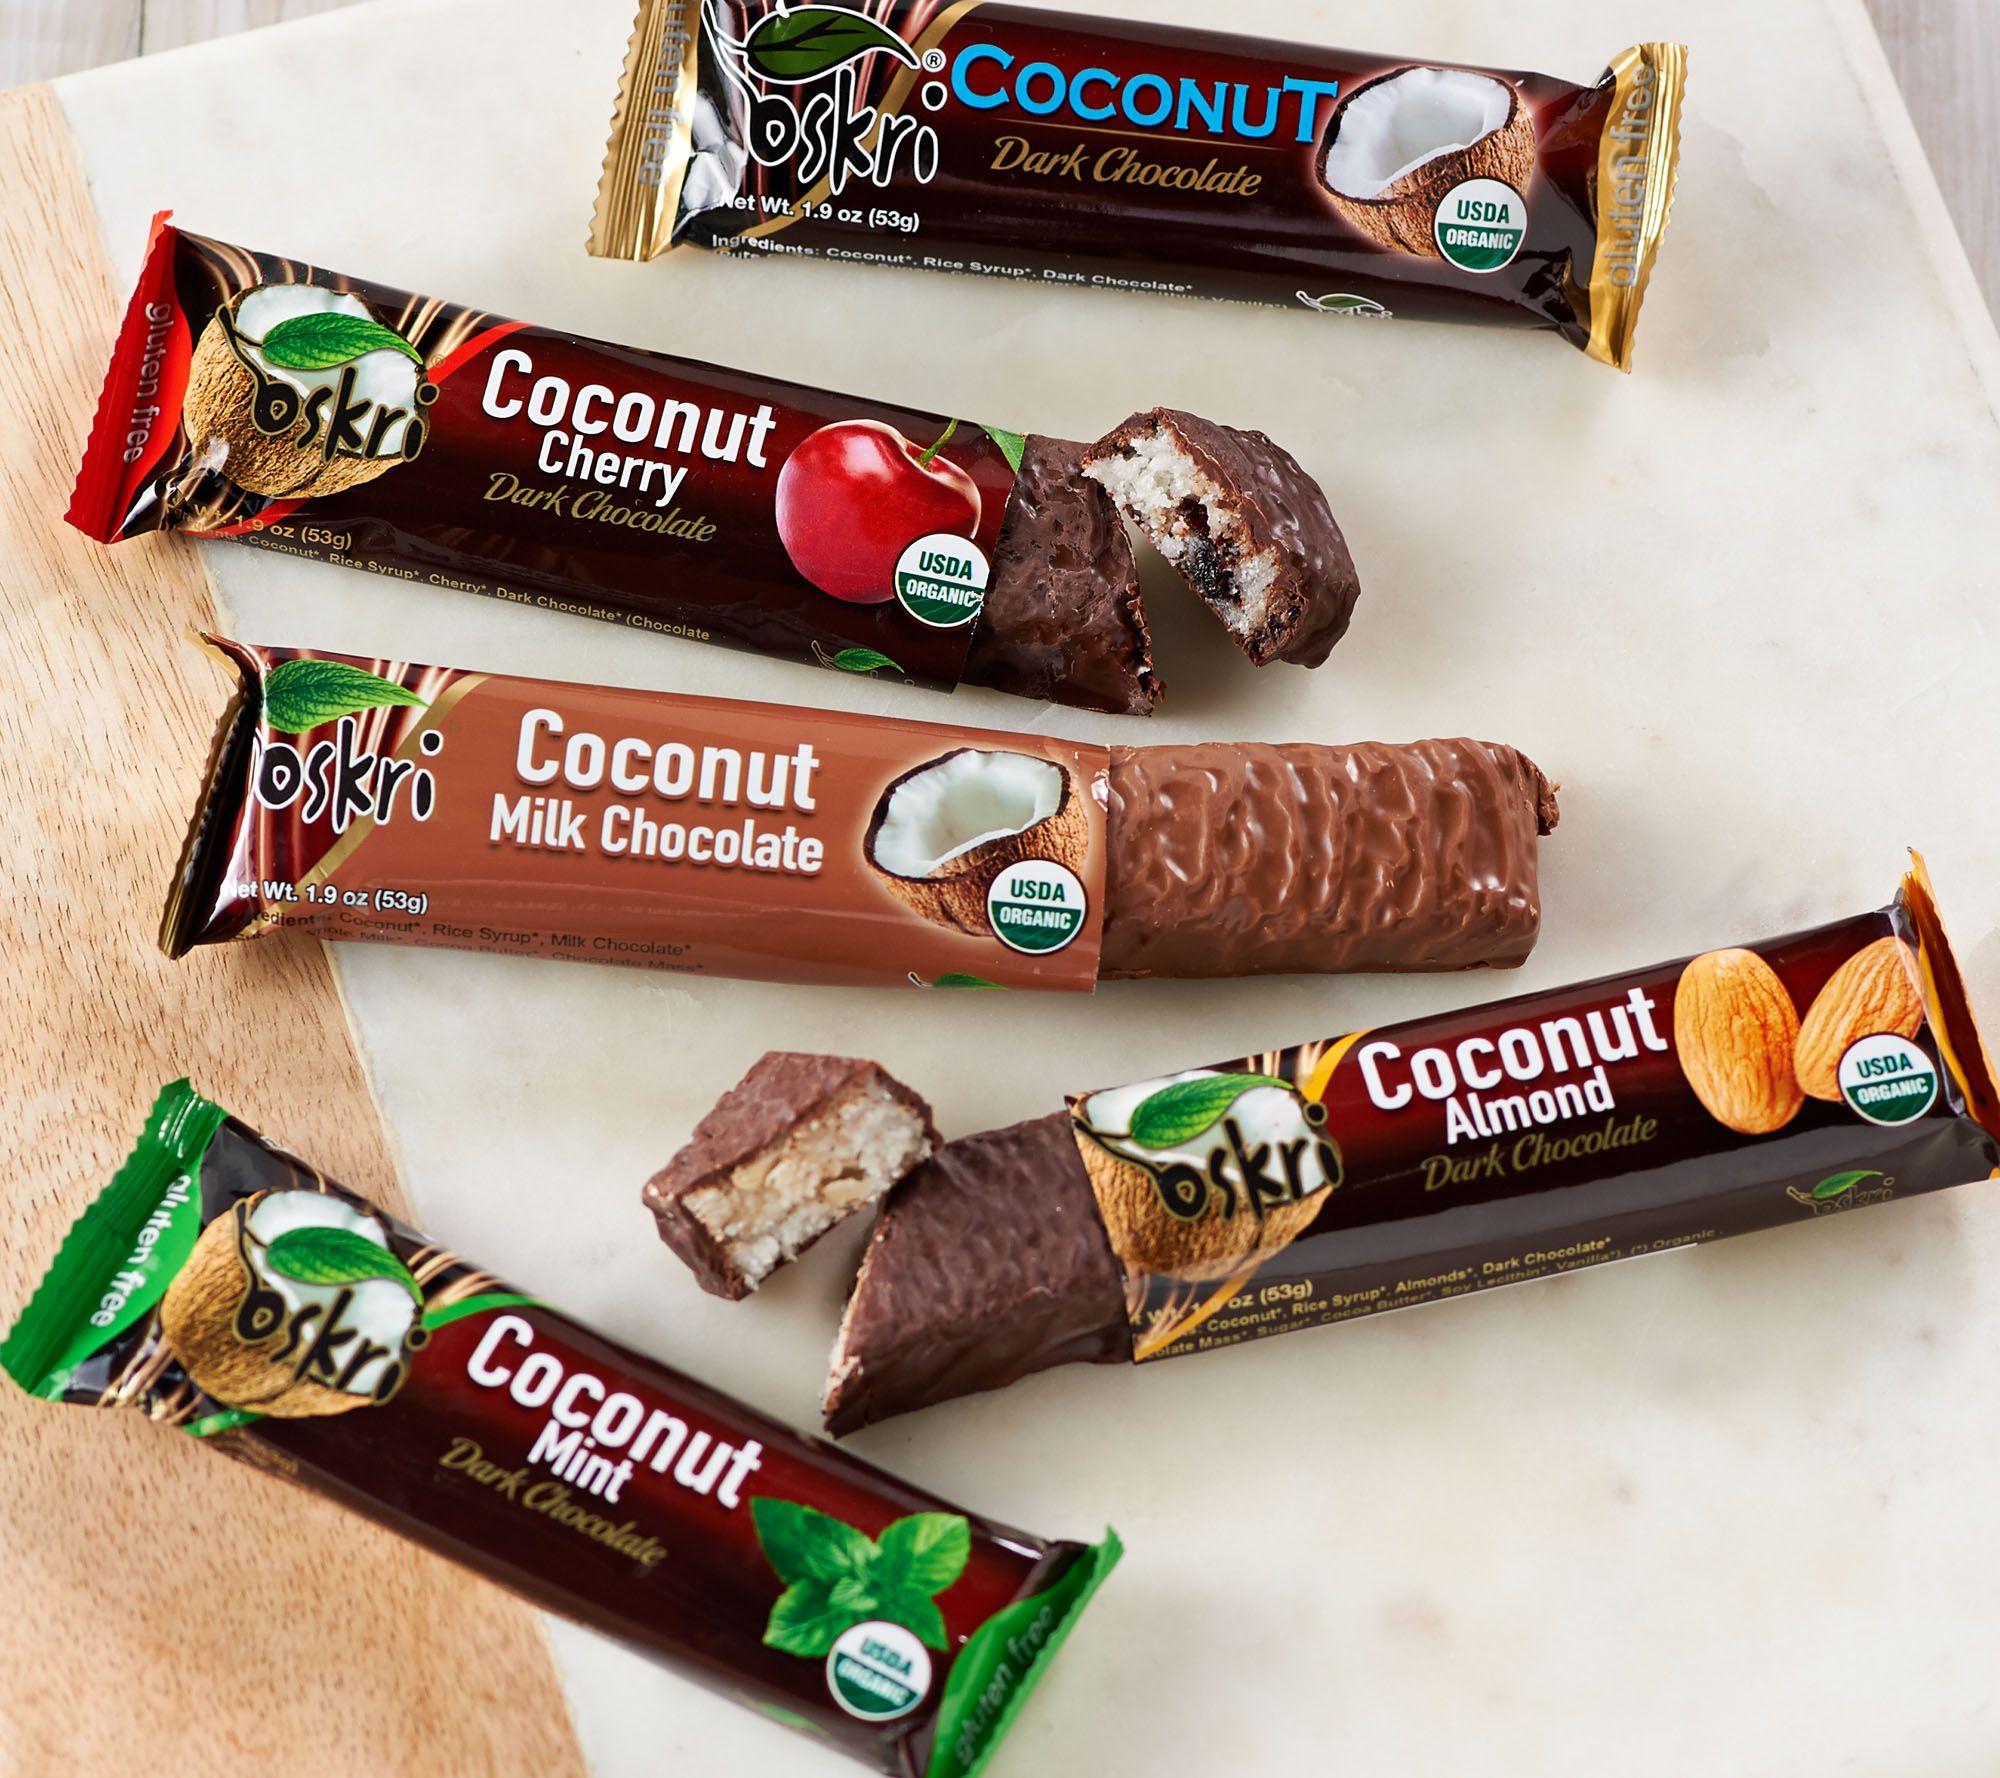 Ships 12/4 Oskri 20 Organic Choc. Covered Coconut Bar Assortment ...